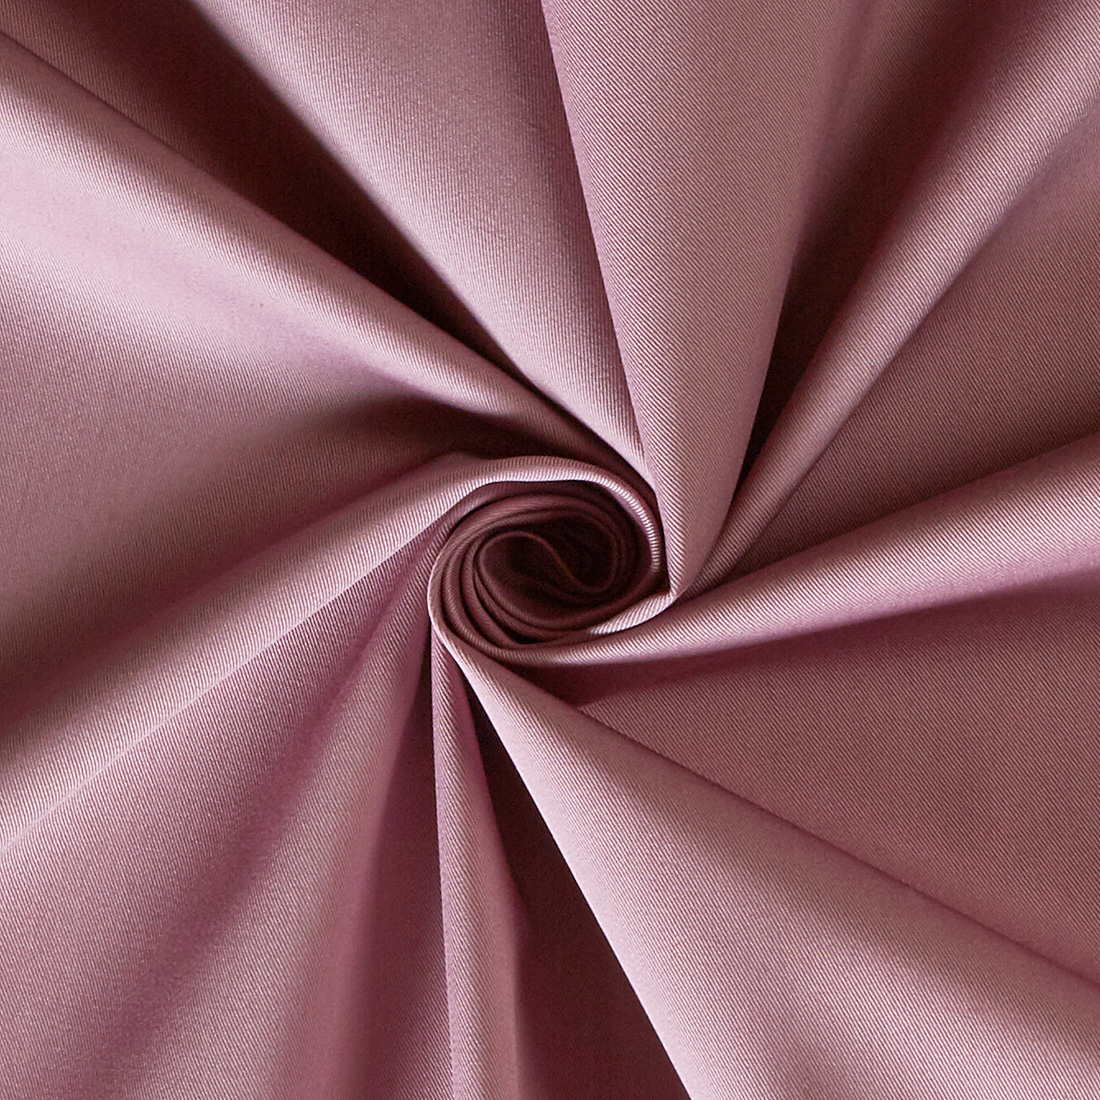 Luxury Cotton Sateen Antique Rose